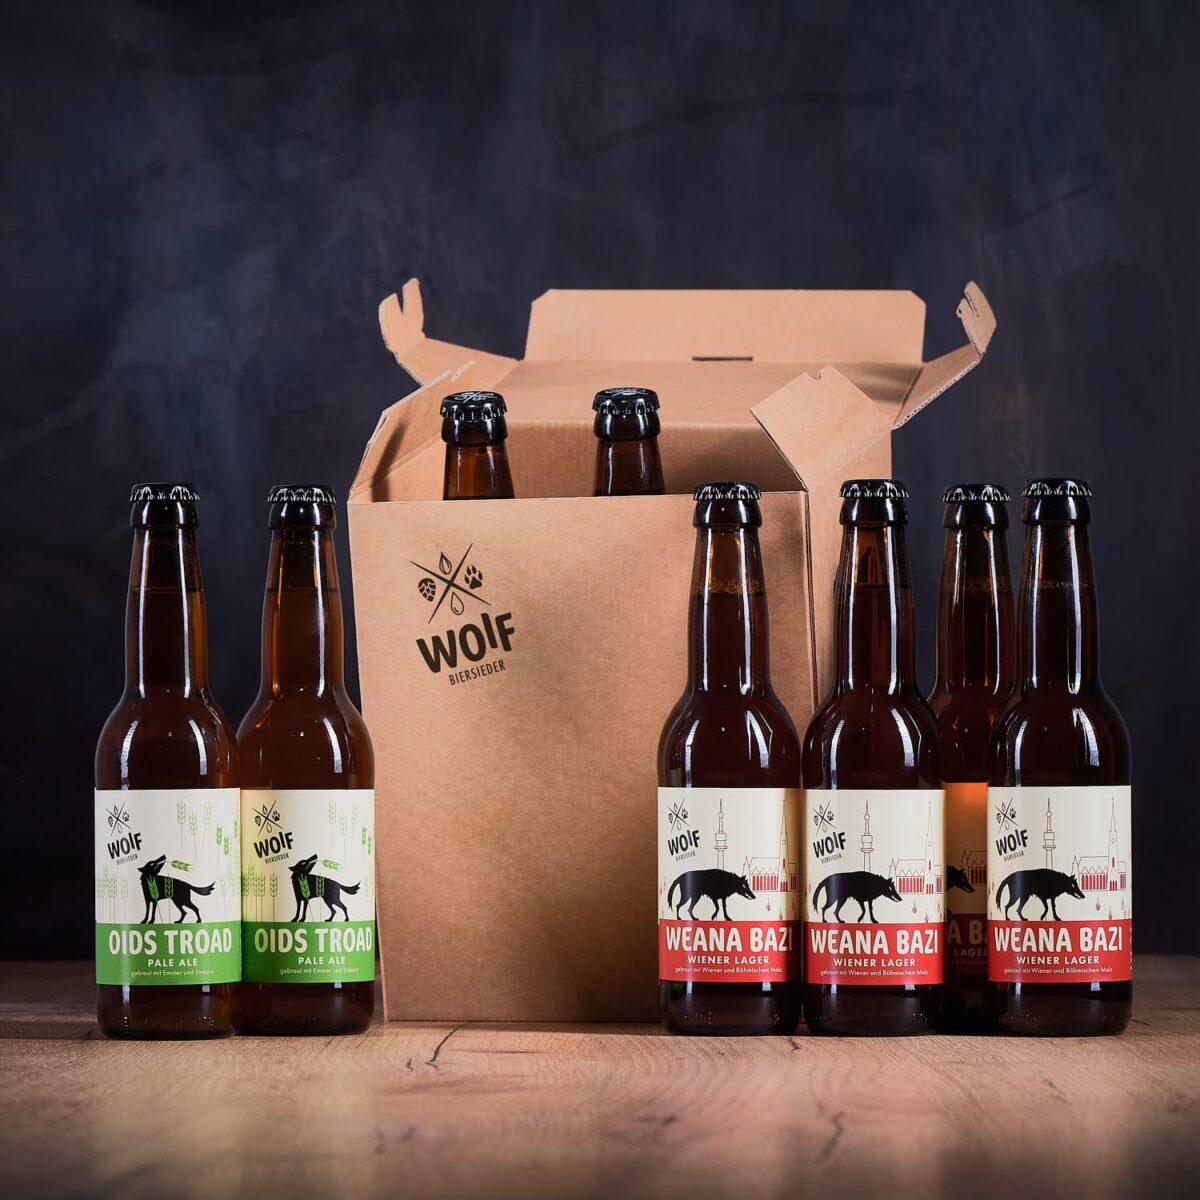 Woif Bier Box - 8